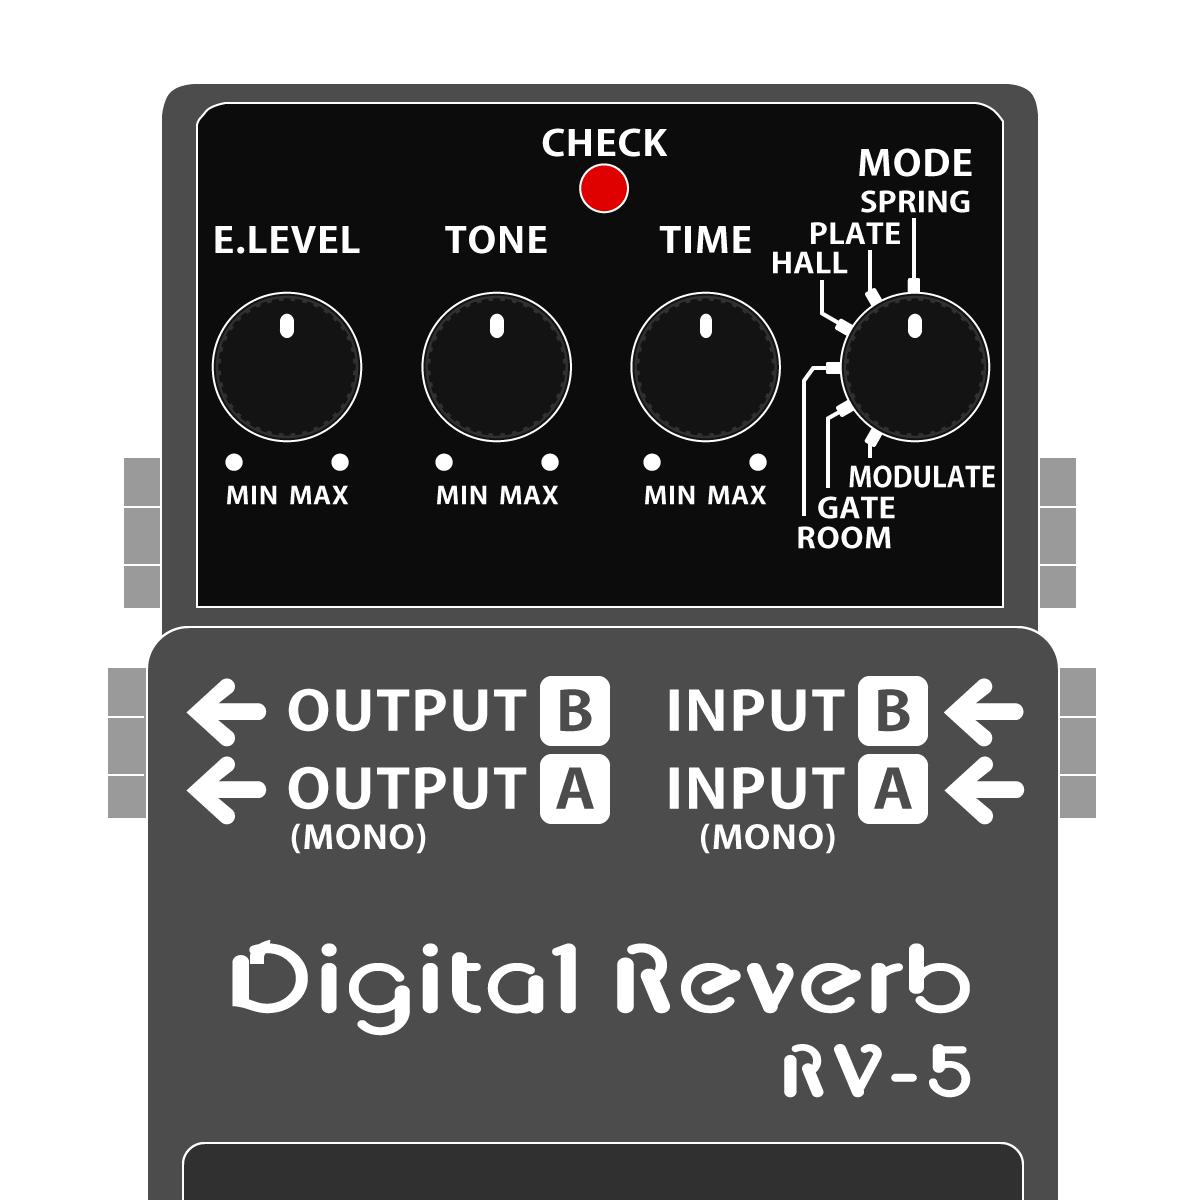 RV-5 Digital Reverb(デジタルリバーブ)